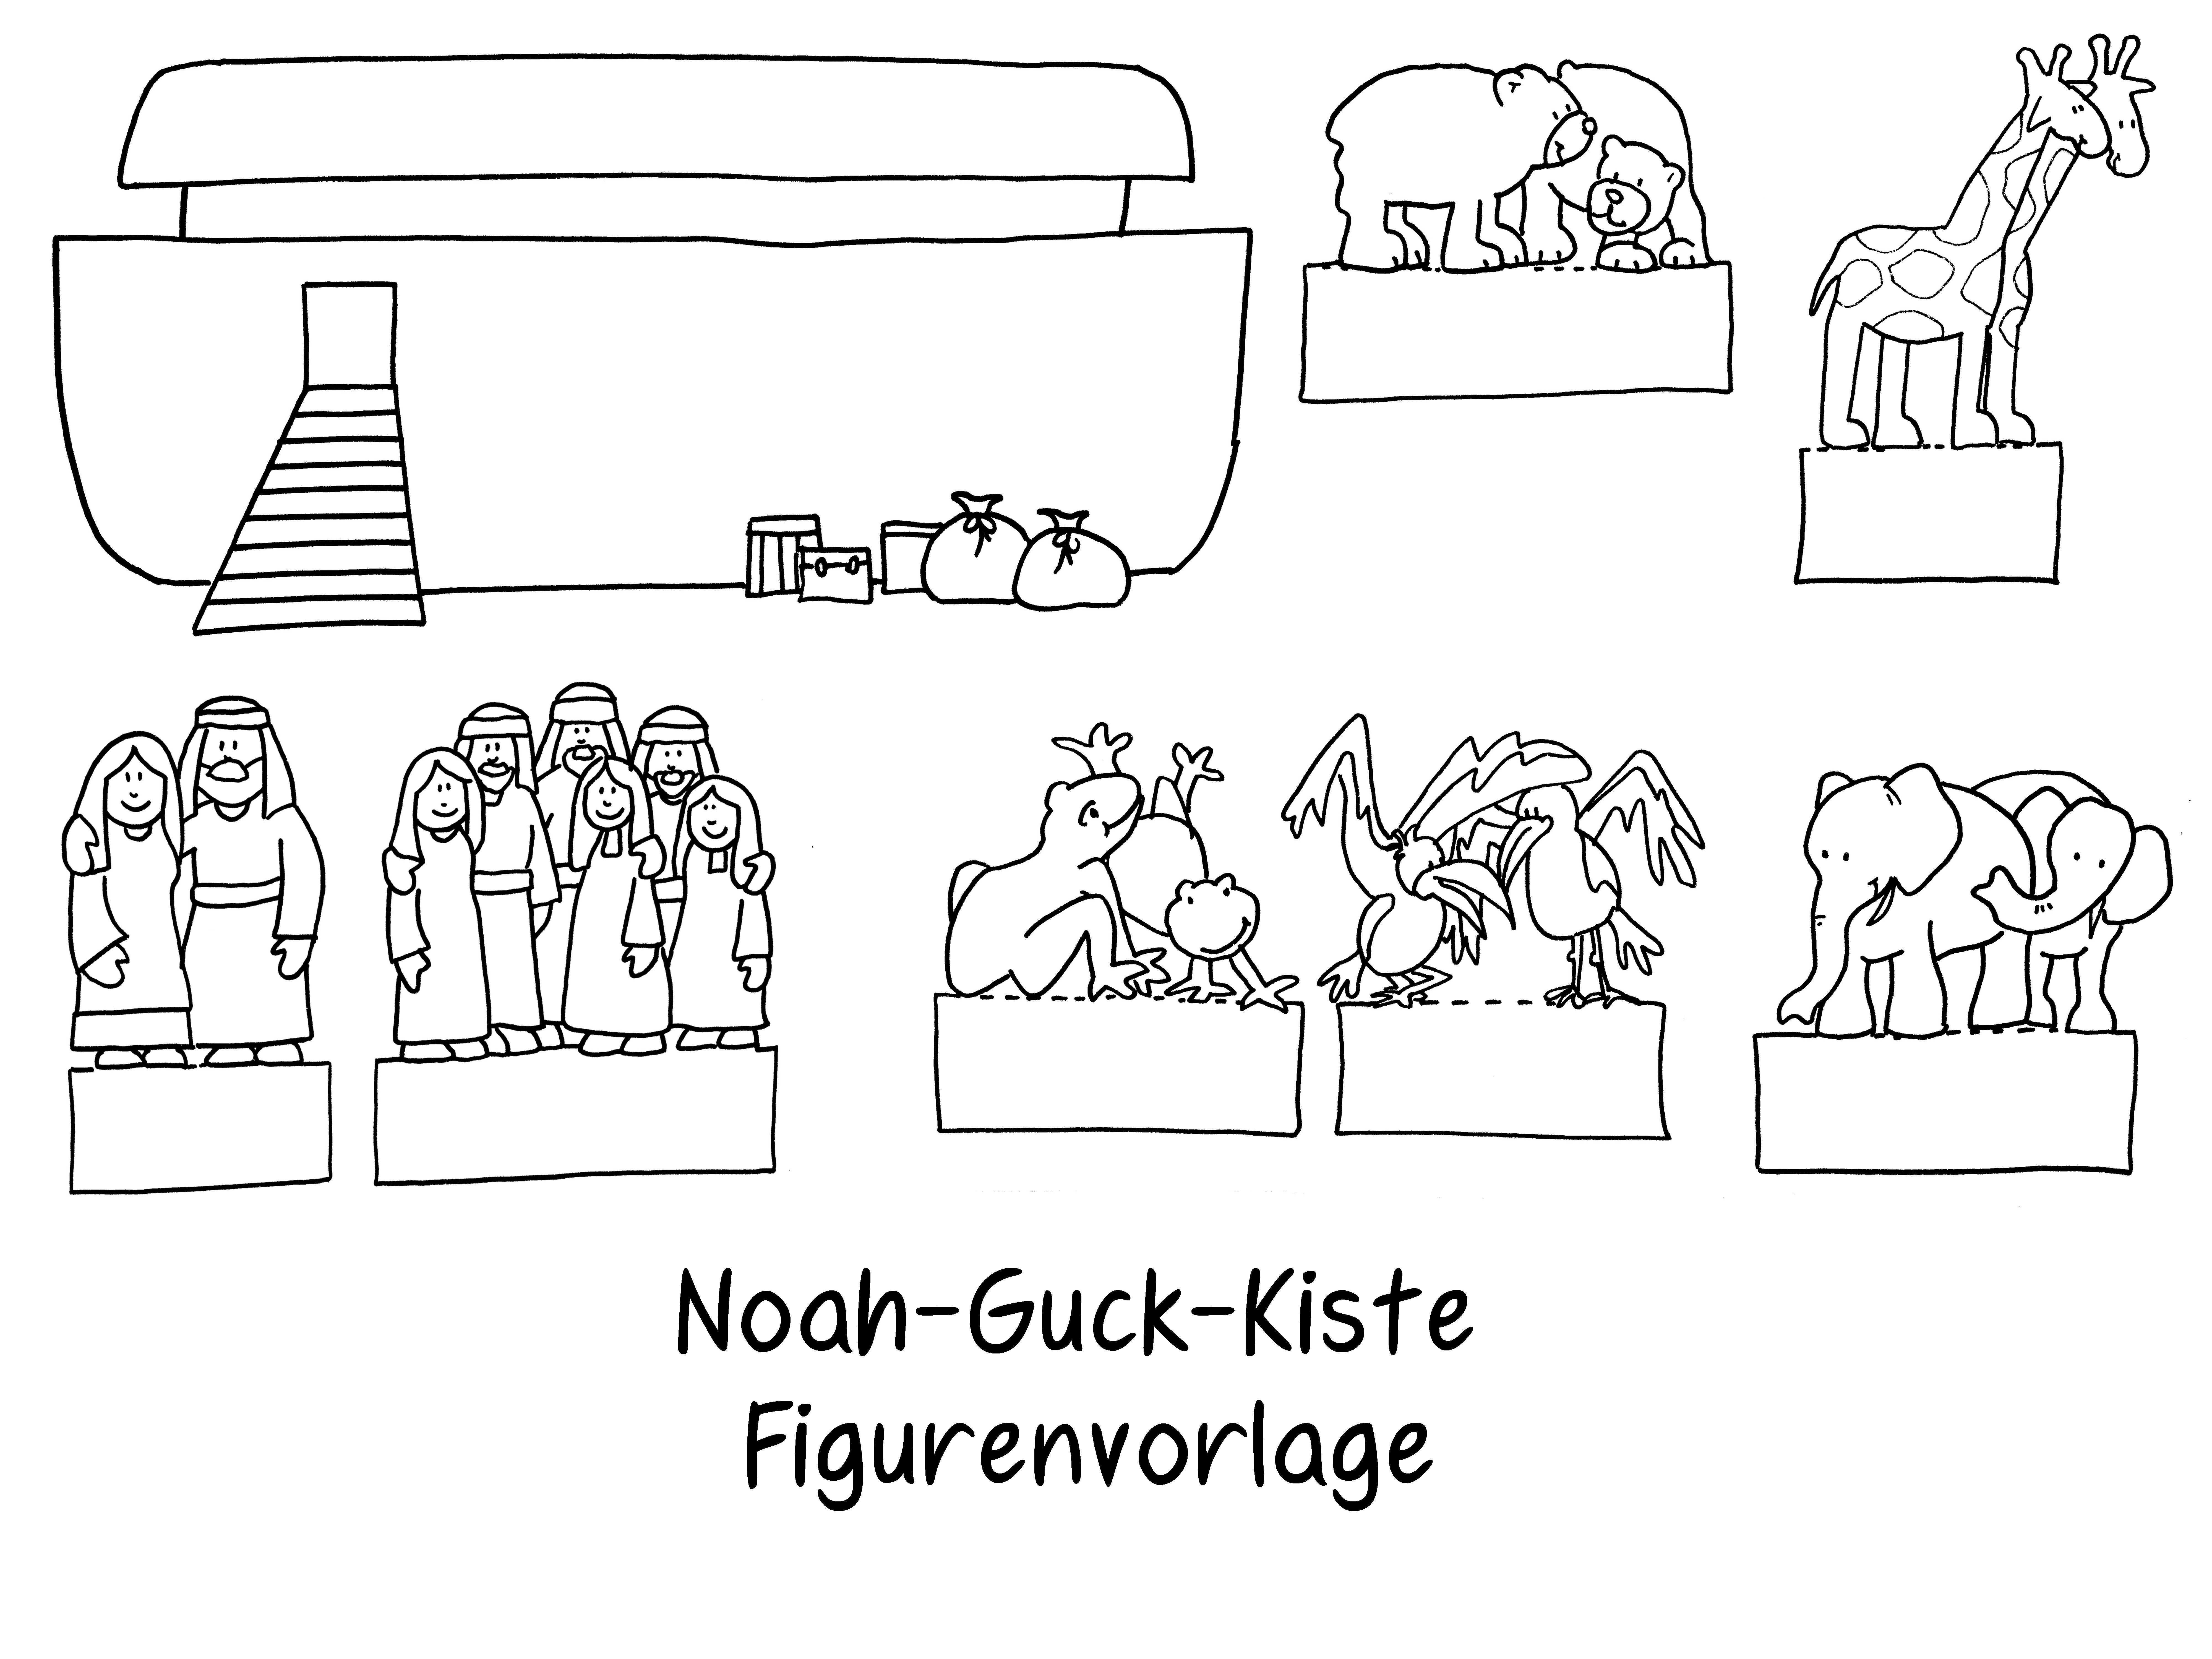 Figurenvorlage Noah Guck Kiste Kinderbibel Religionsunterricht Alltag Kinder